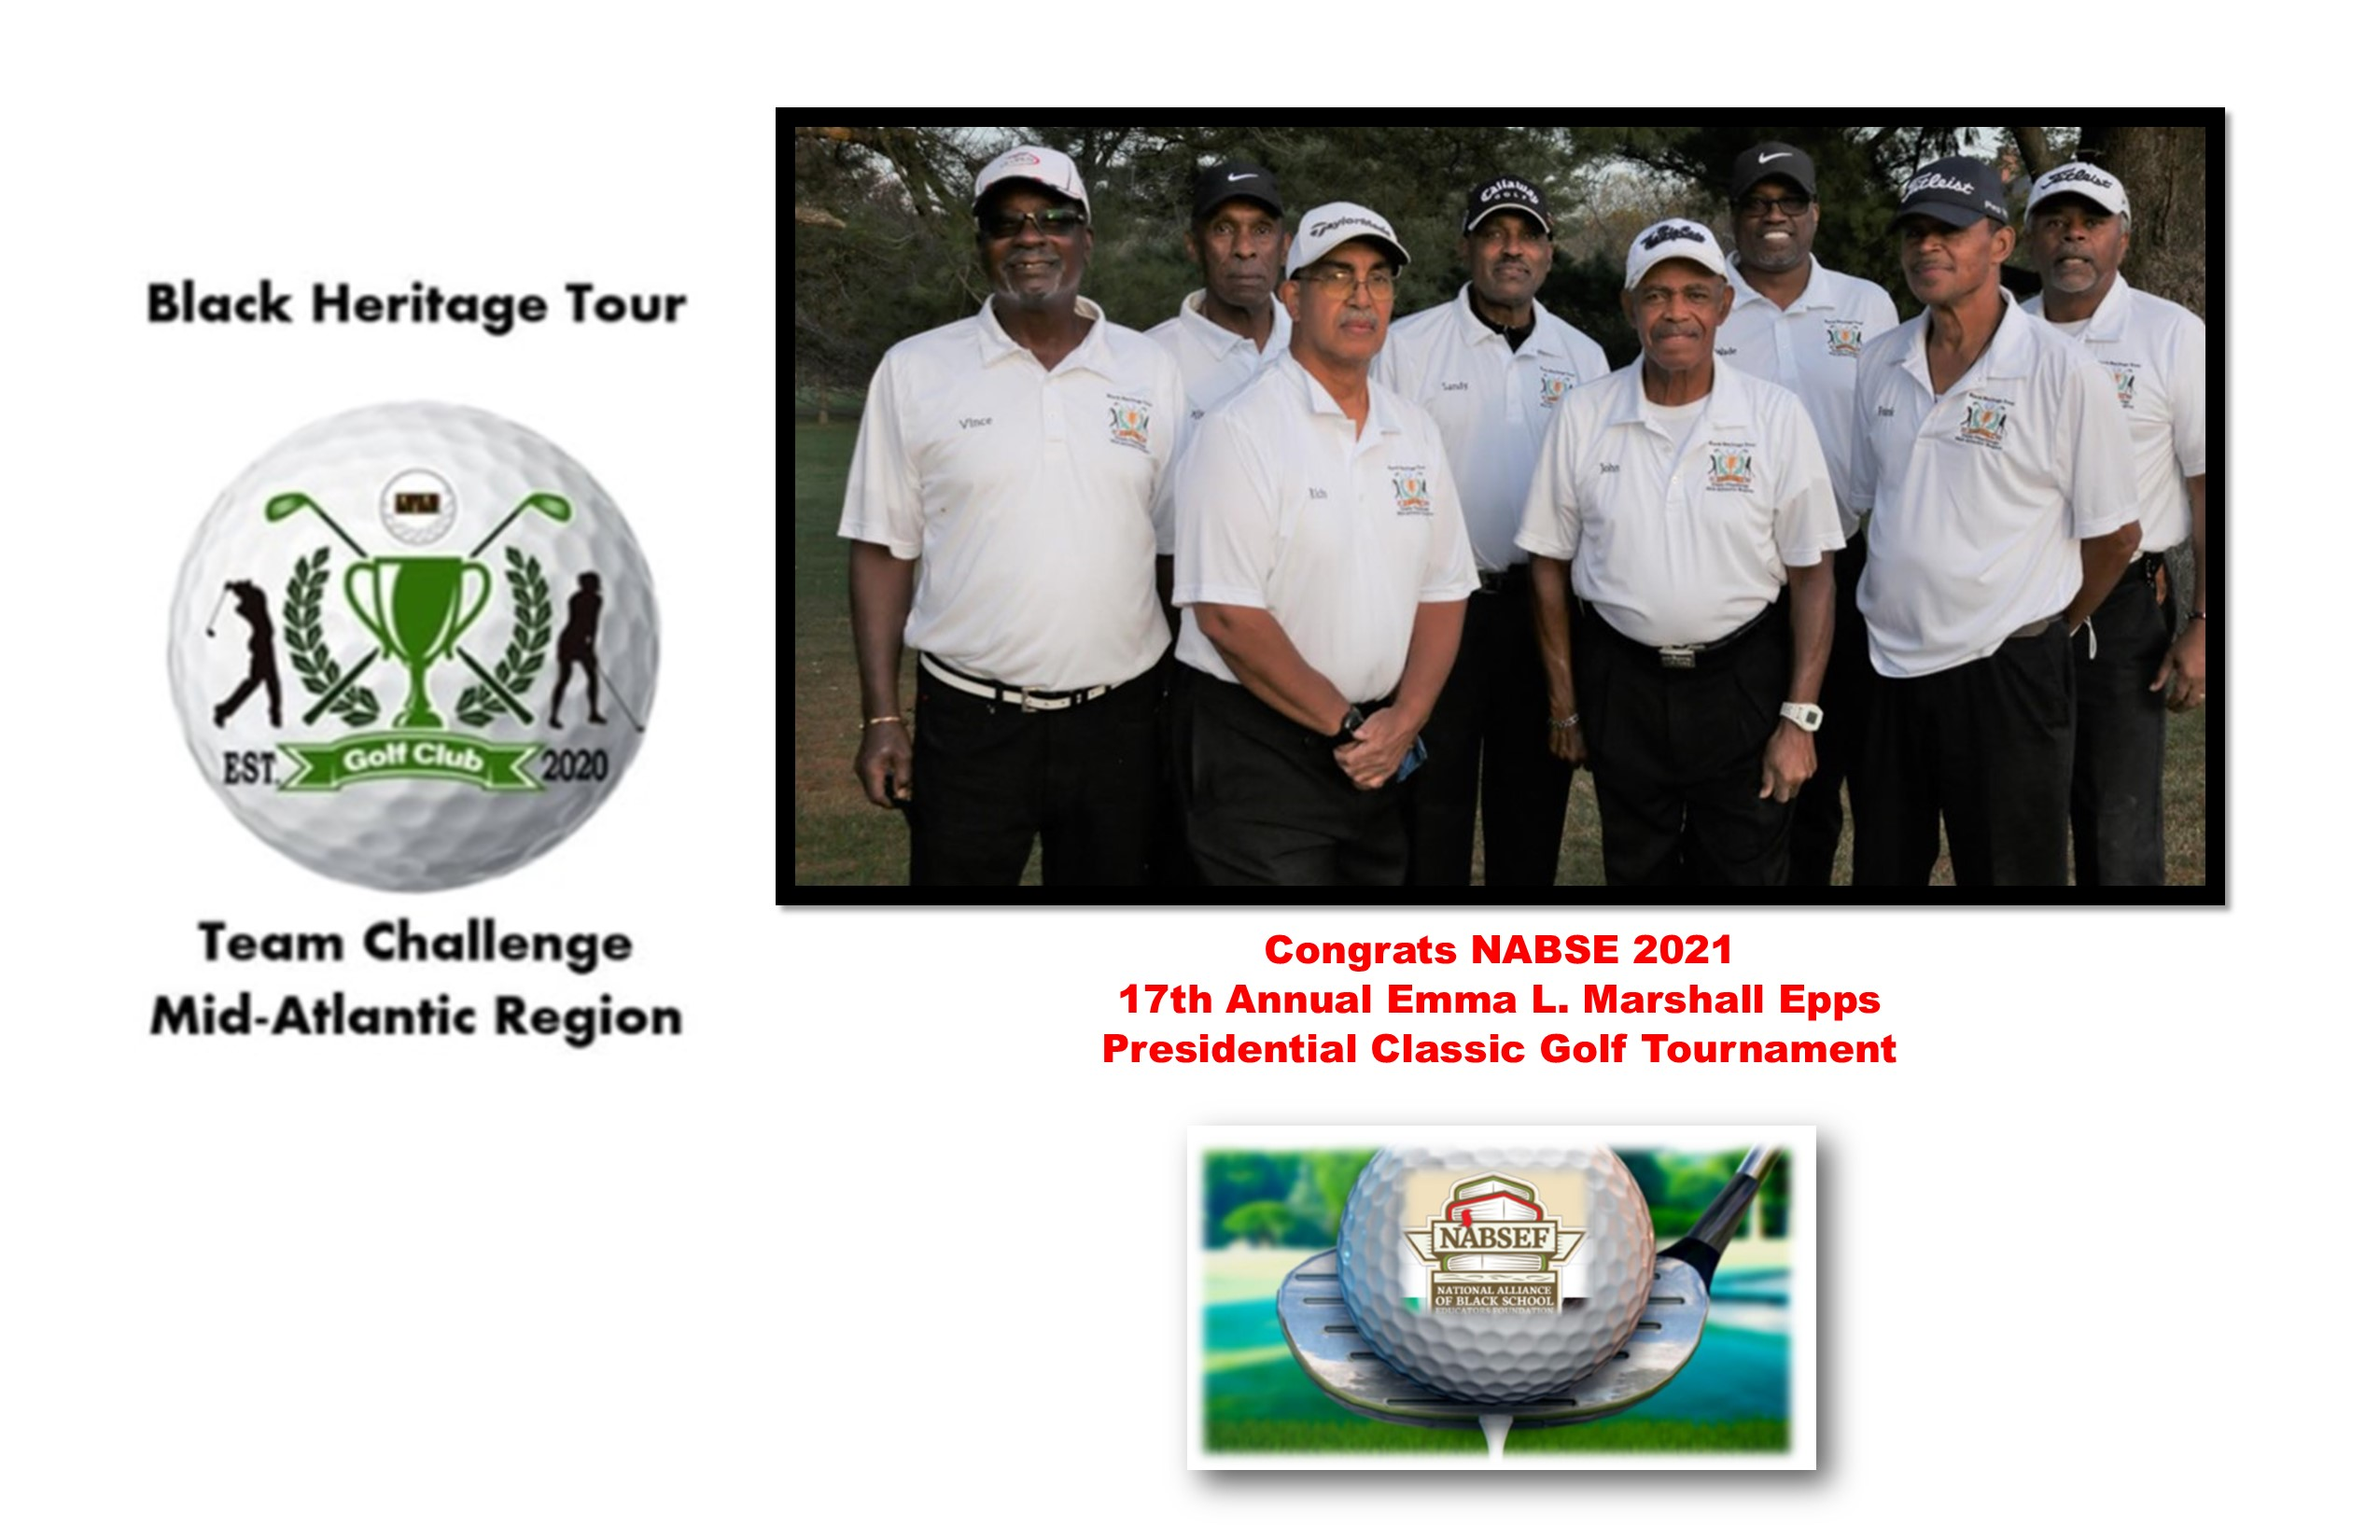 Black Heritage Tour Board of Directors